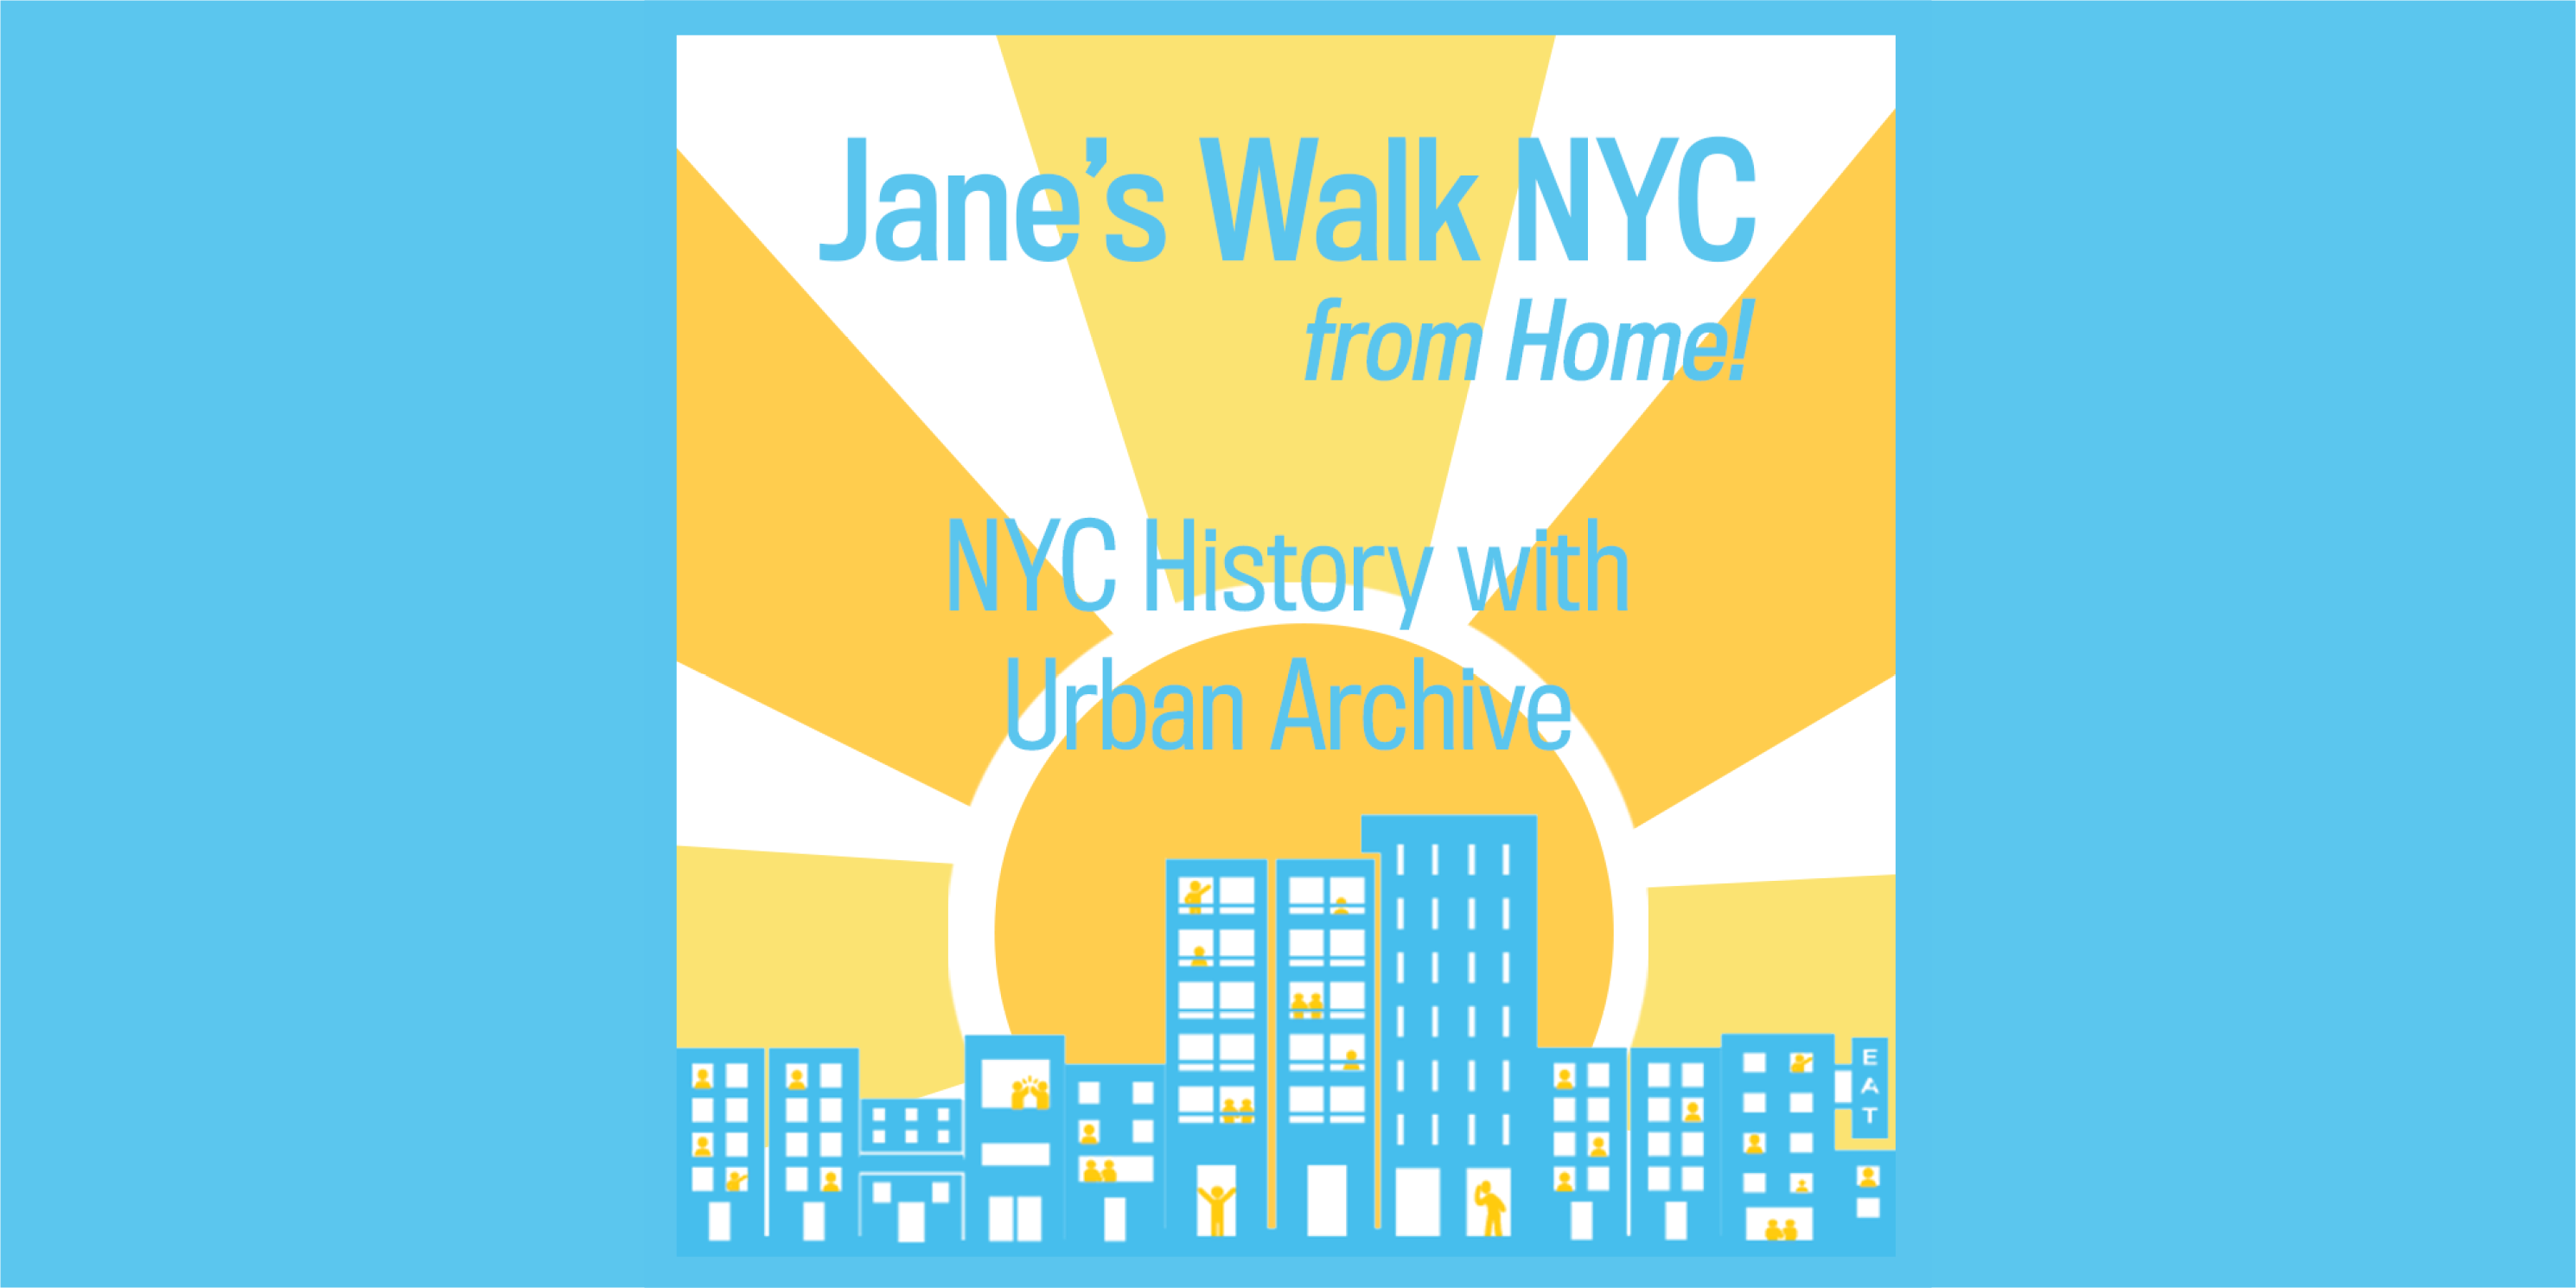 Advertisement for Jane's Walk 2020, Day 7 activities